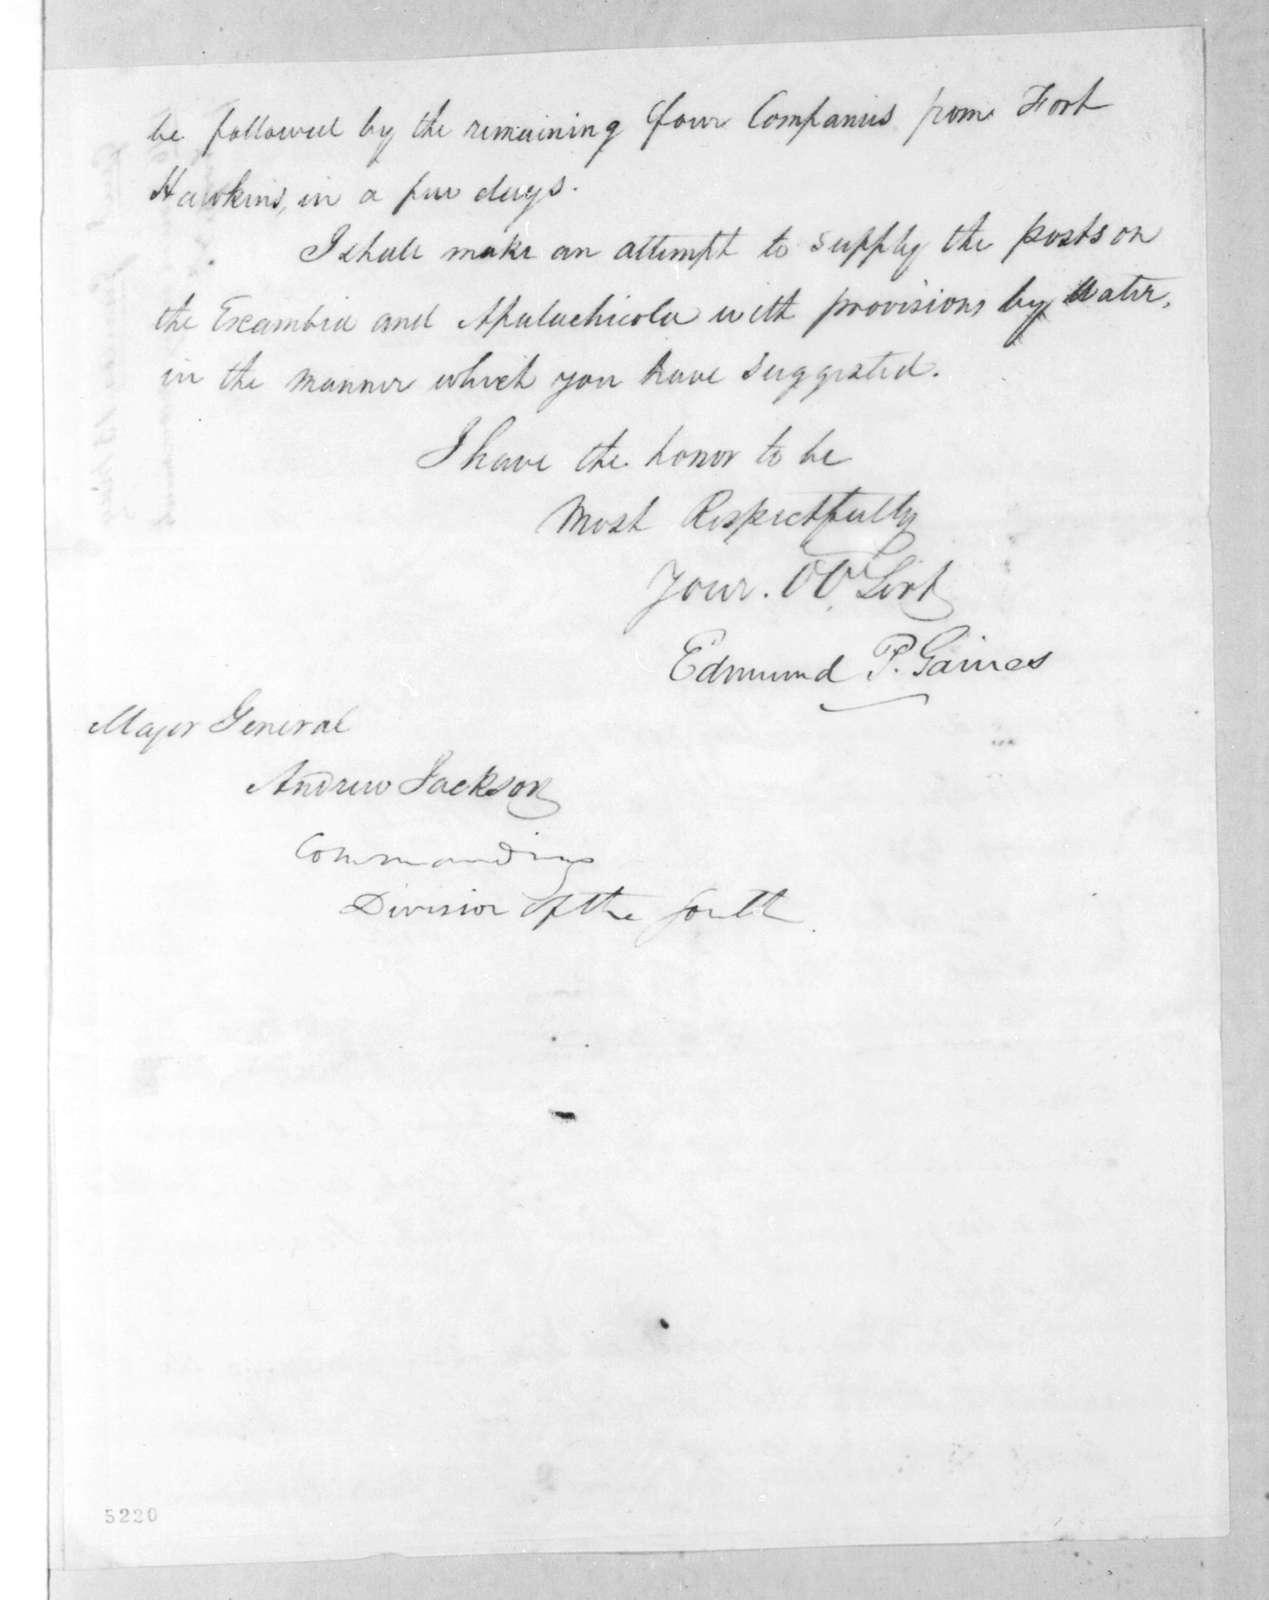 Edmund Pendleton Gaines to Andrew Jackson, May 14, 1816